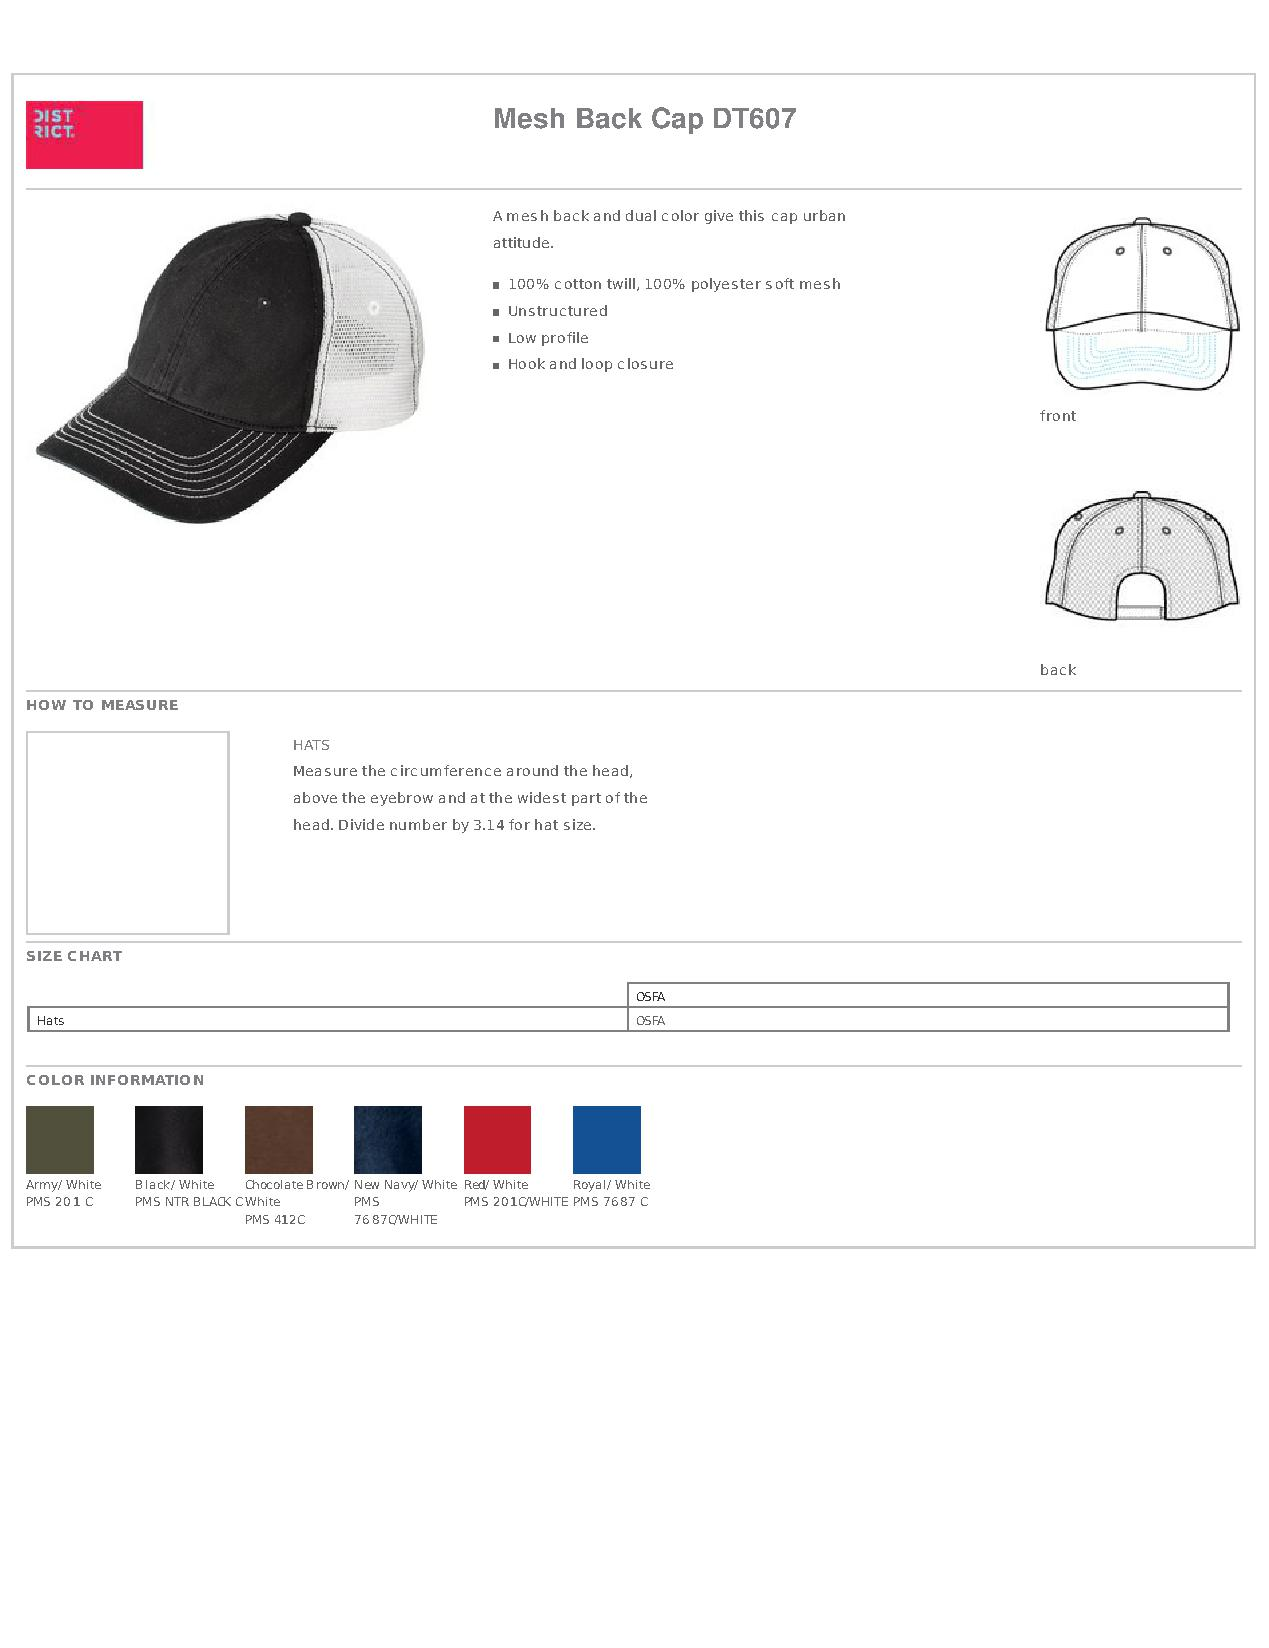 3539a97e1c76a2 Popular Designs. custom design of District® DT607 Mesh Back Cap